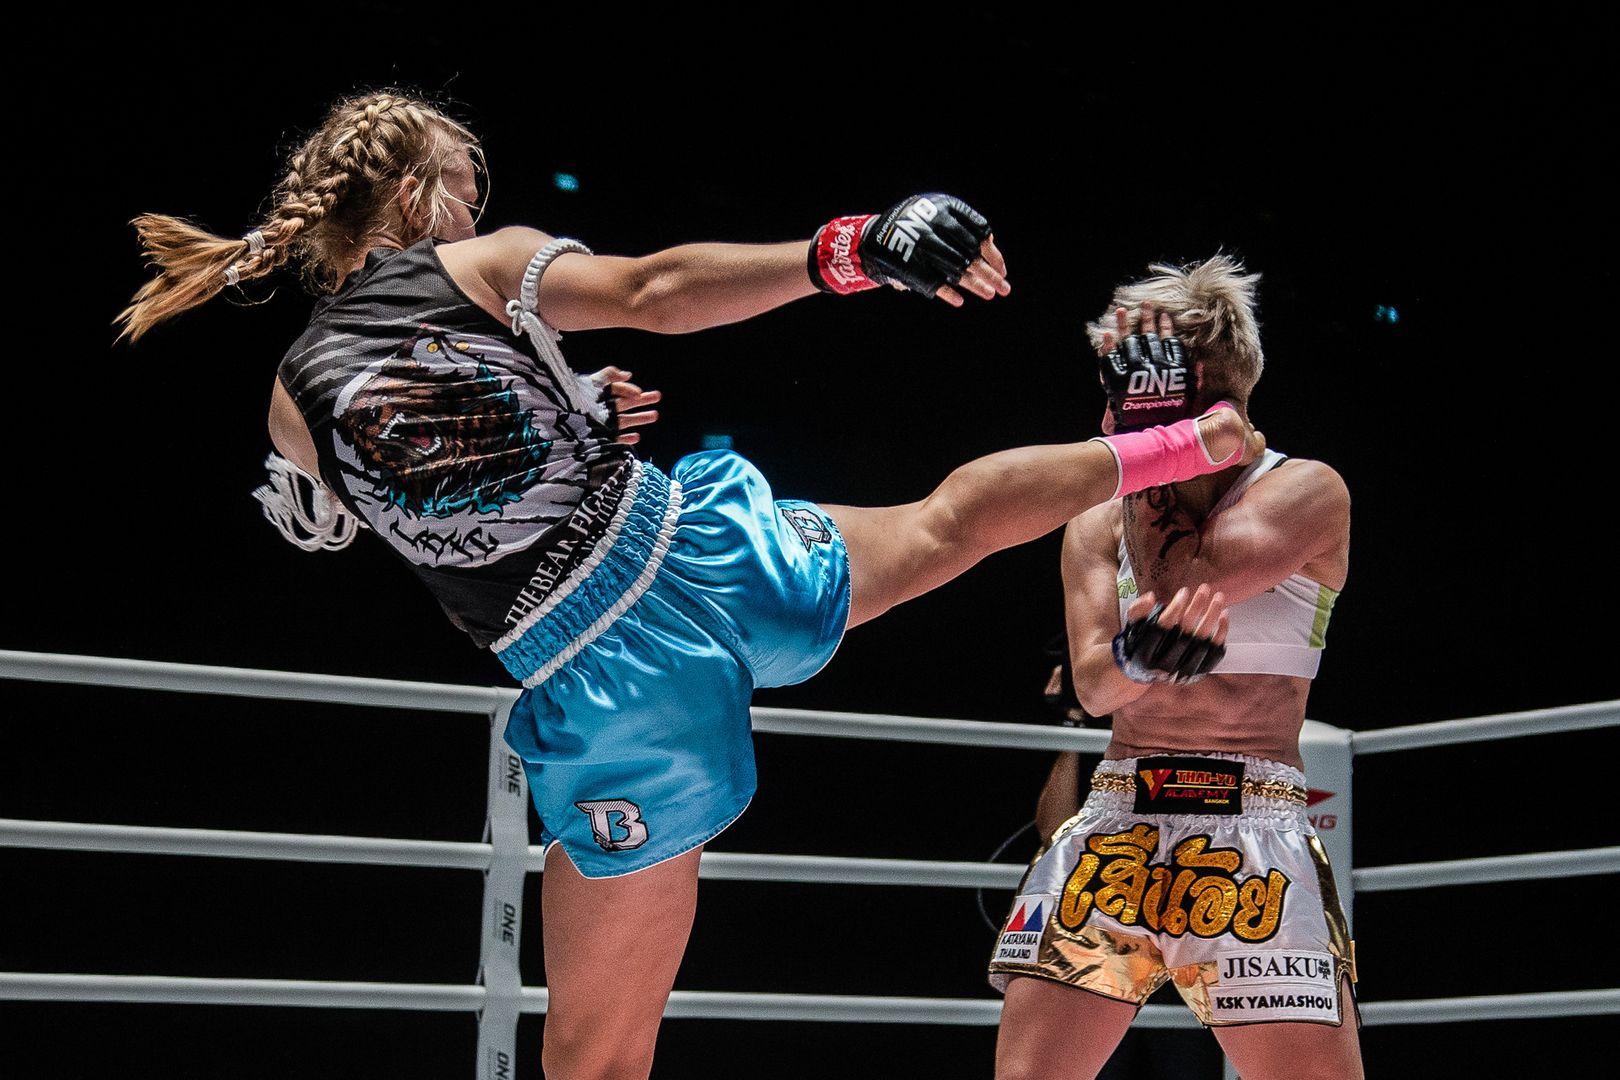 Marie Ruumet throws a head kick at Little Tiger